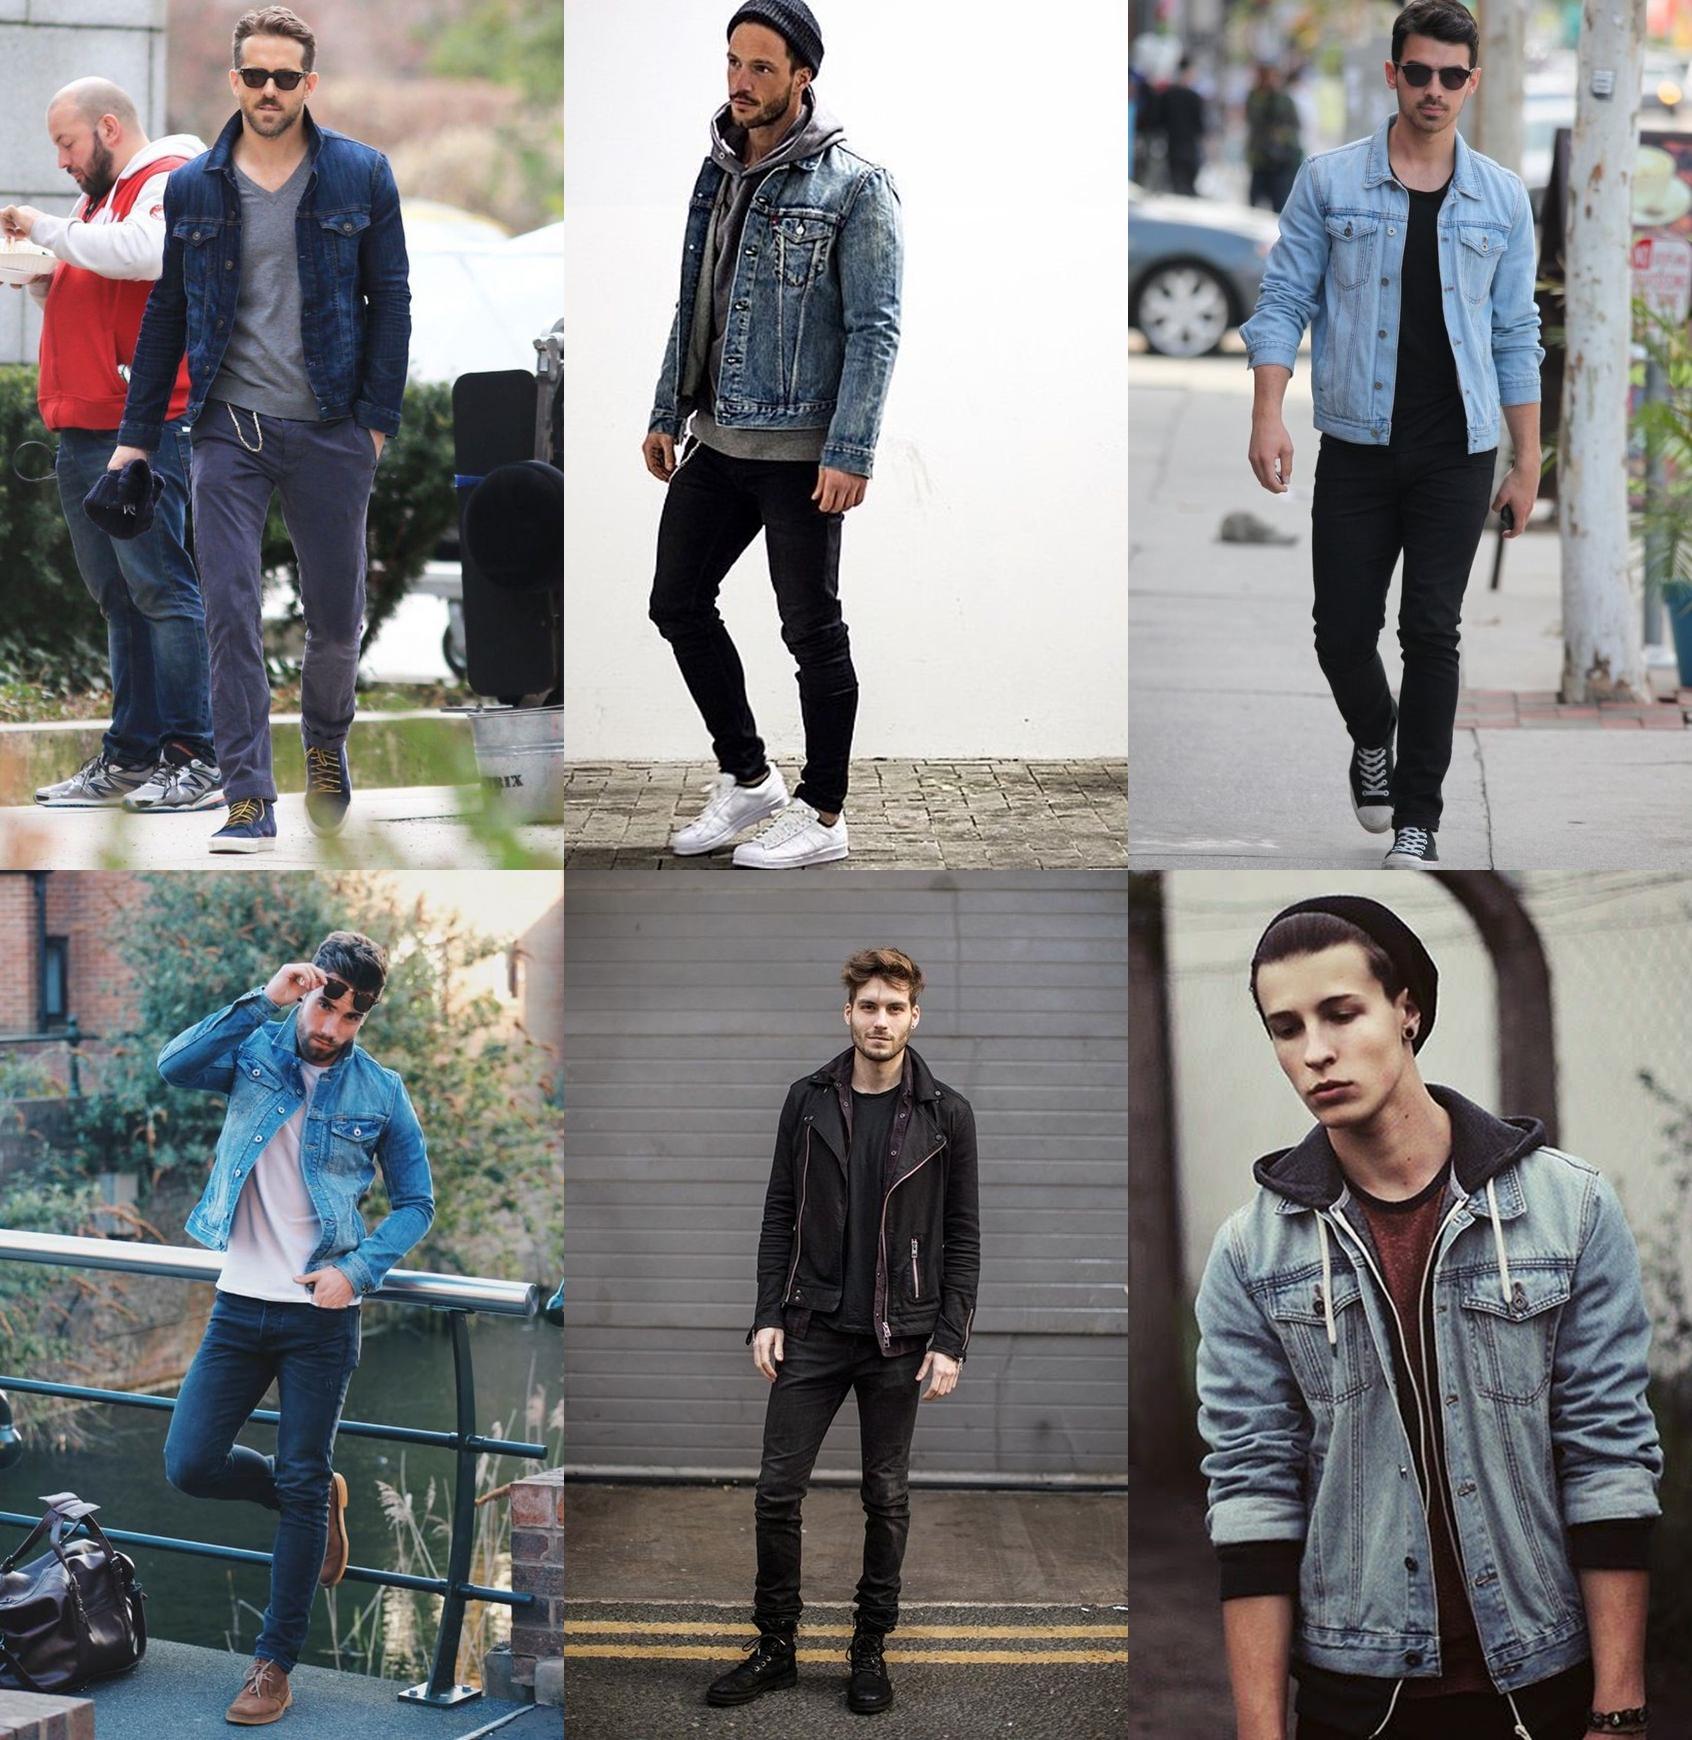 jaqueta masculina, , jacket for men, tendencia de moda masculina 2017, look masculino 2017, estilo masculino, blog de moda masculina, moda sem censura, alex cursino, 2